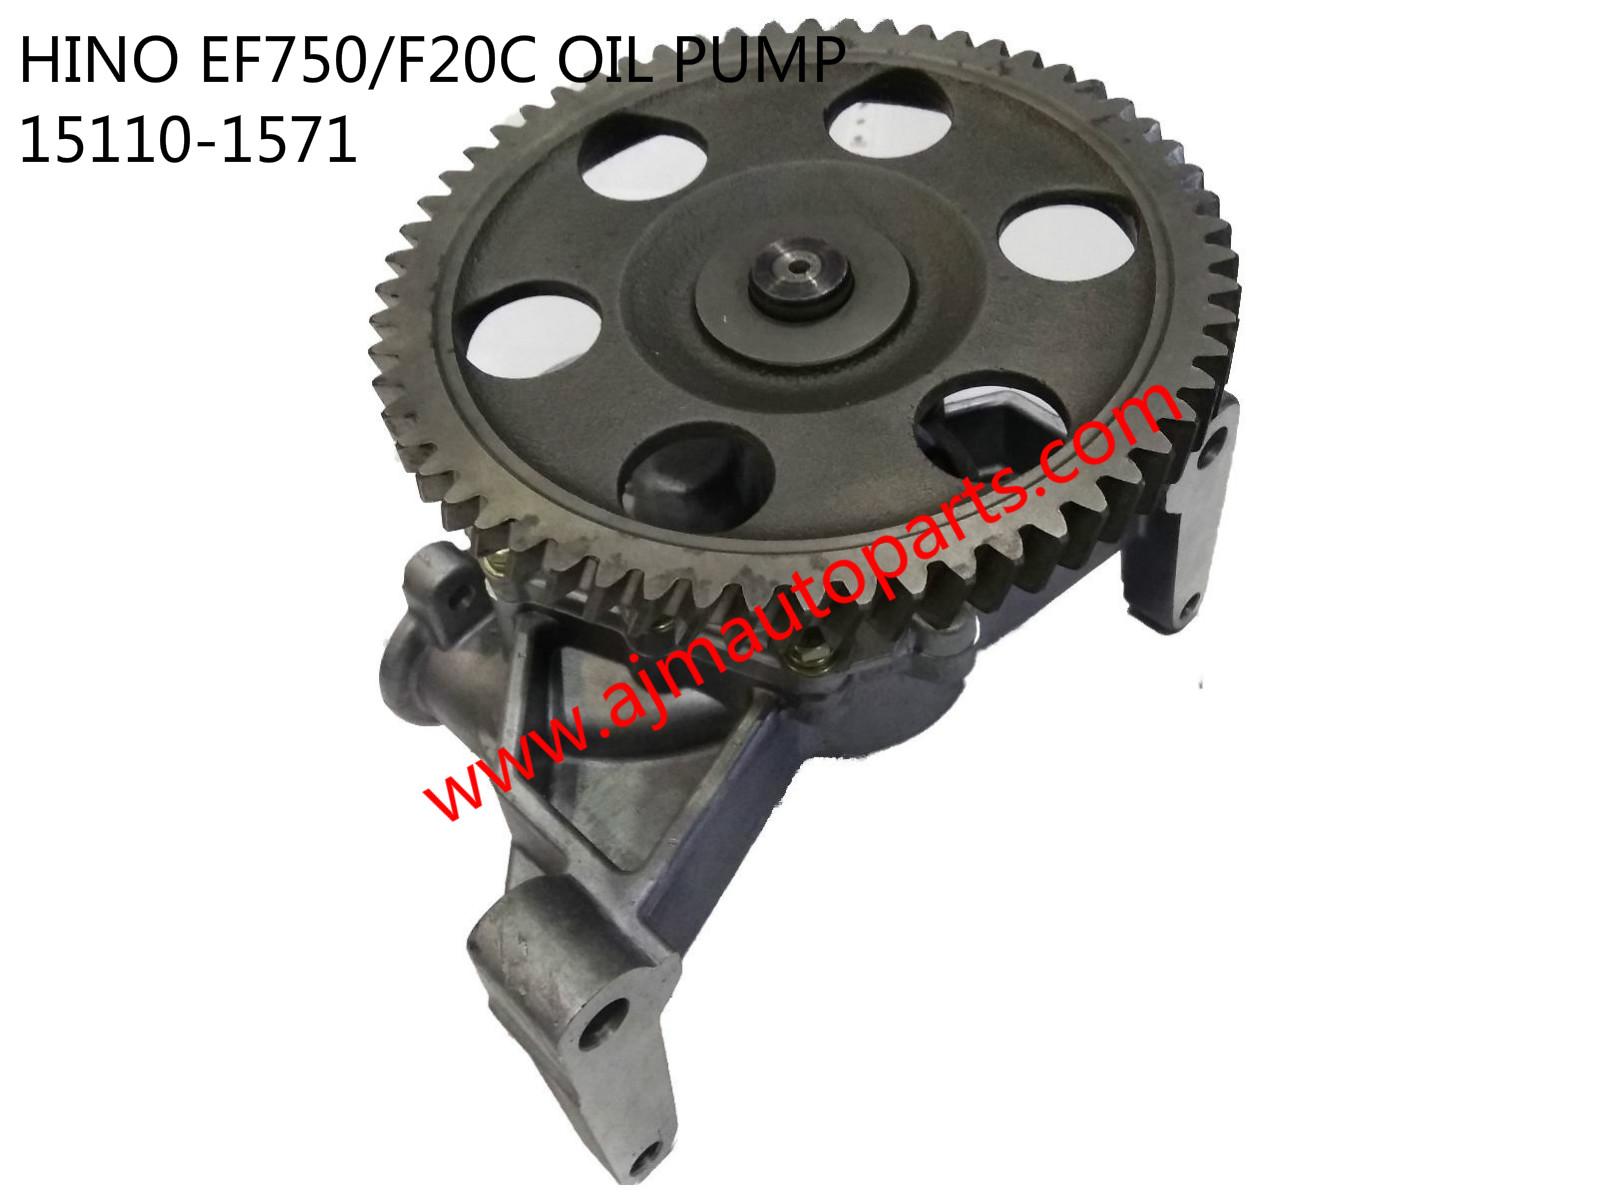 HINO EF750/F20C OIL PUMP-15110-1571